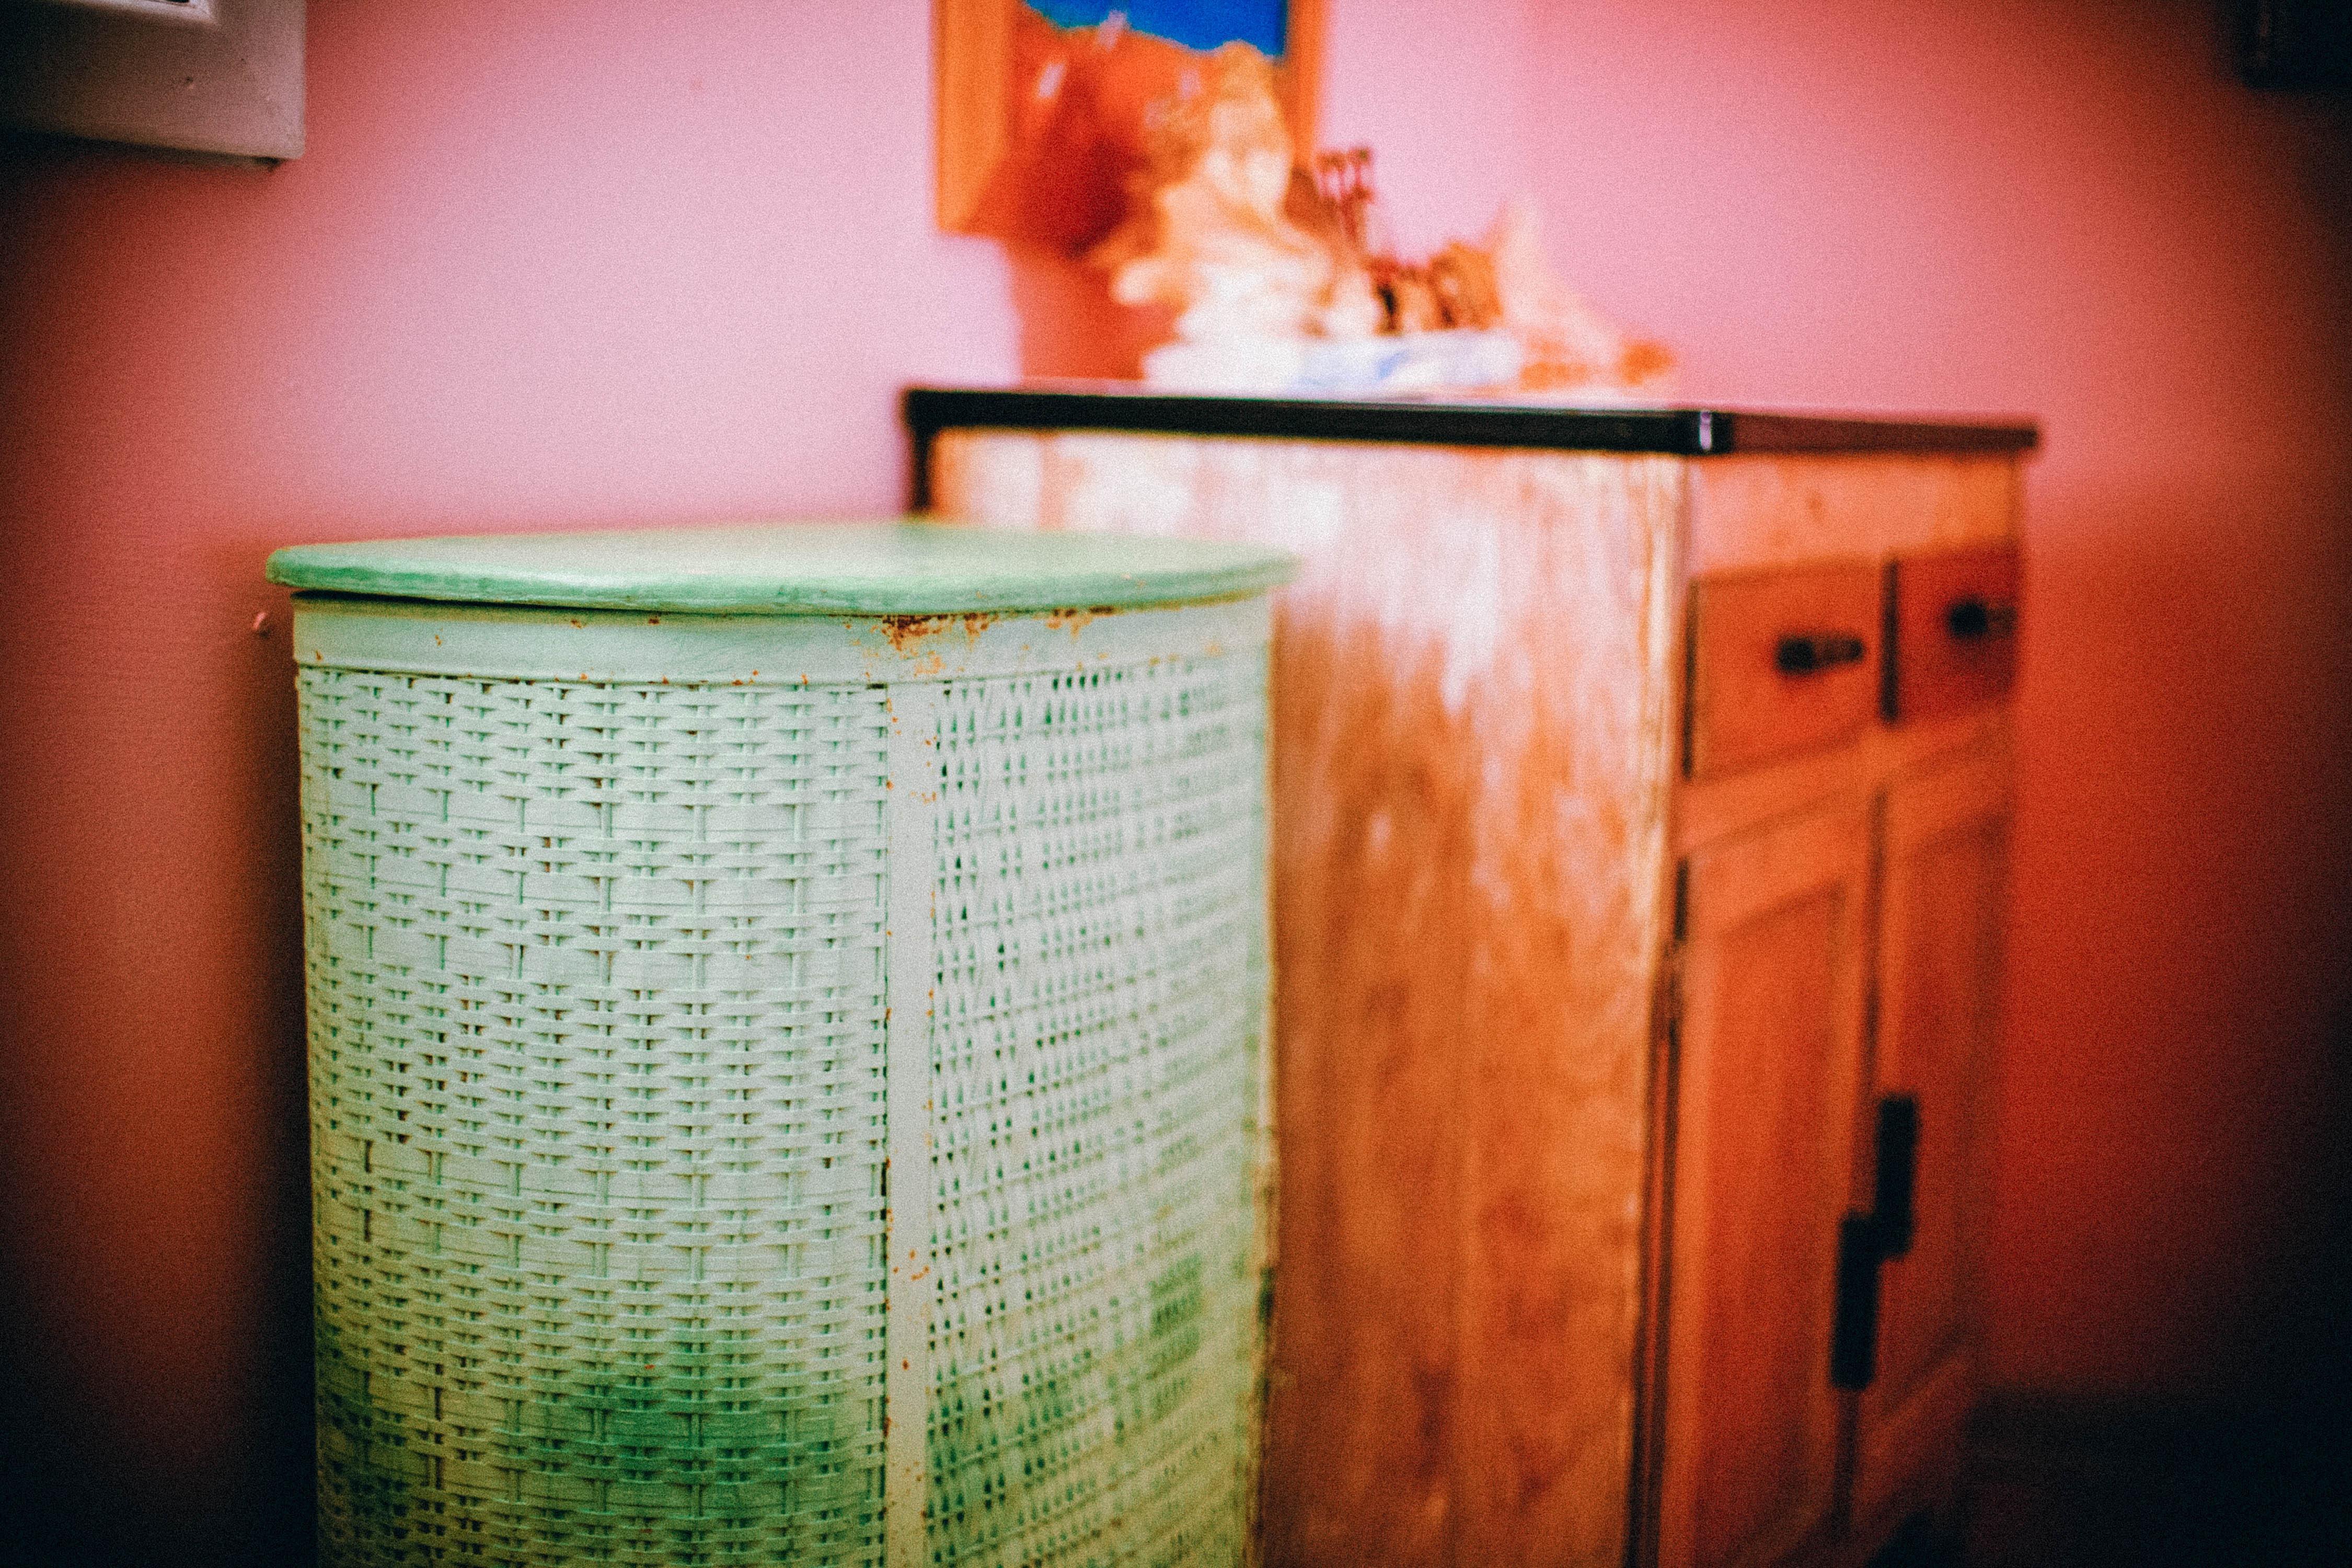 Wall Green Red Color Shelf Furniture Room Lighting Interior Design Bathroom  Art Design Shape Laundry Basket